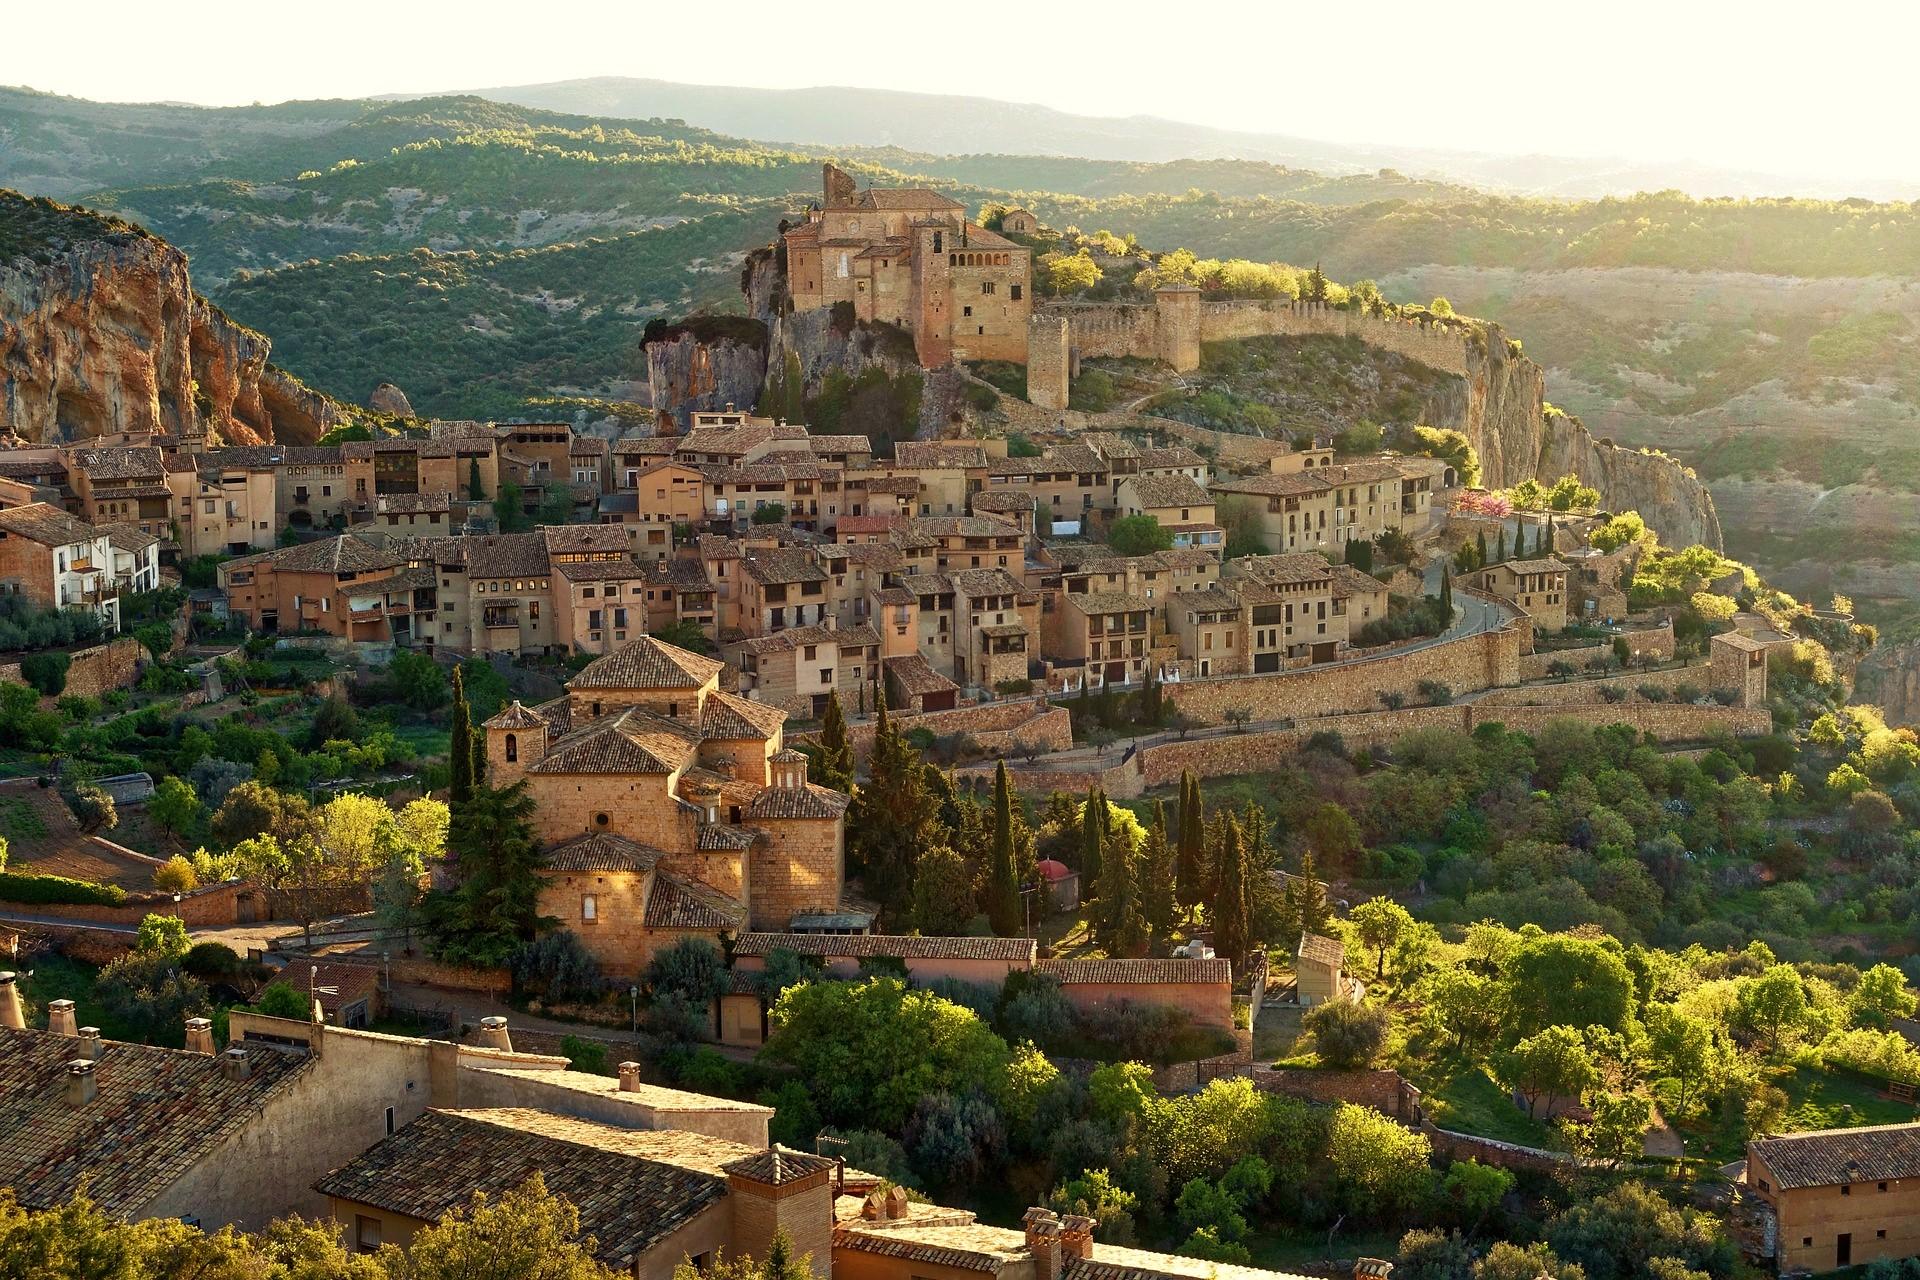 Las Ciudades más Románticas de España - Alquezar, España